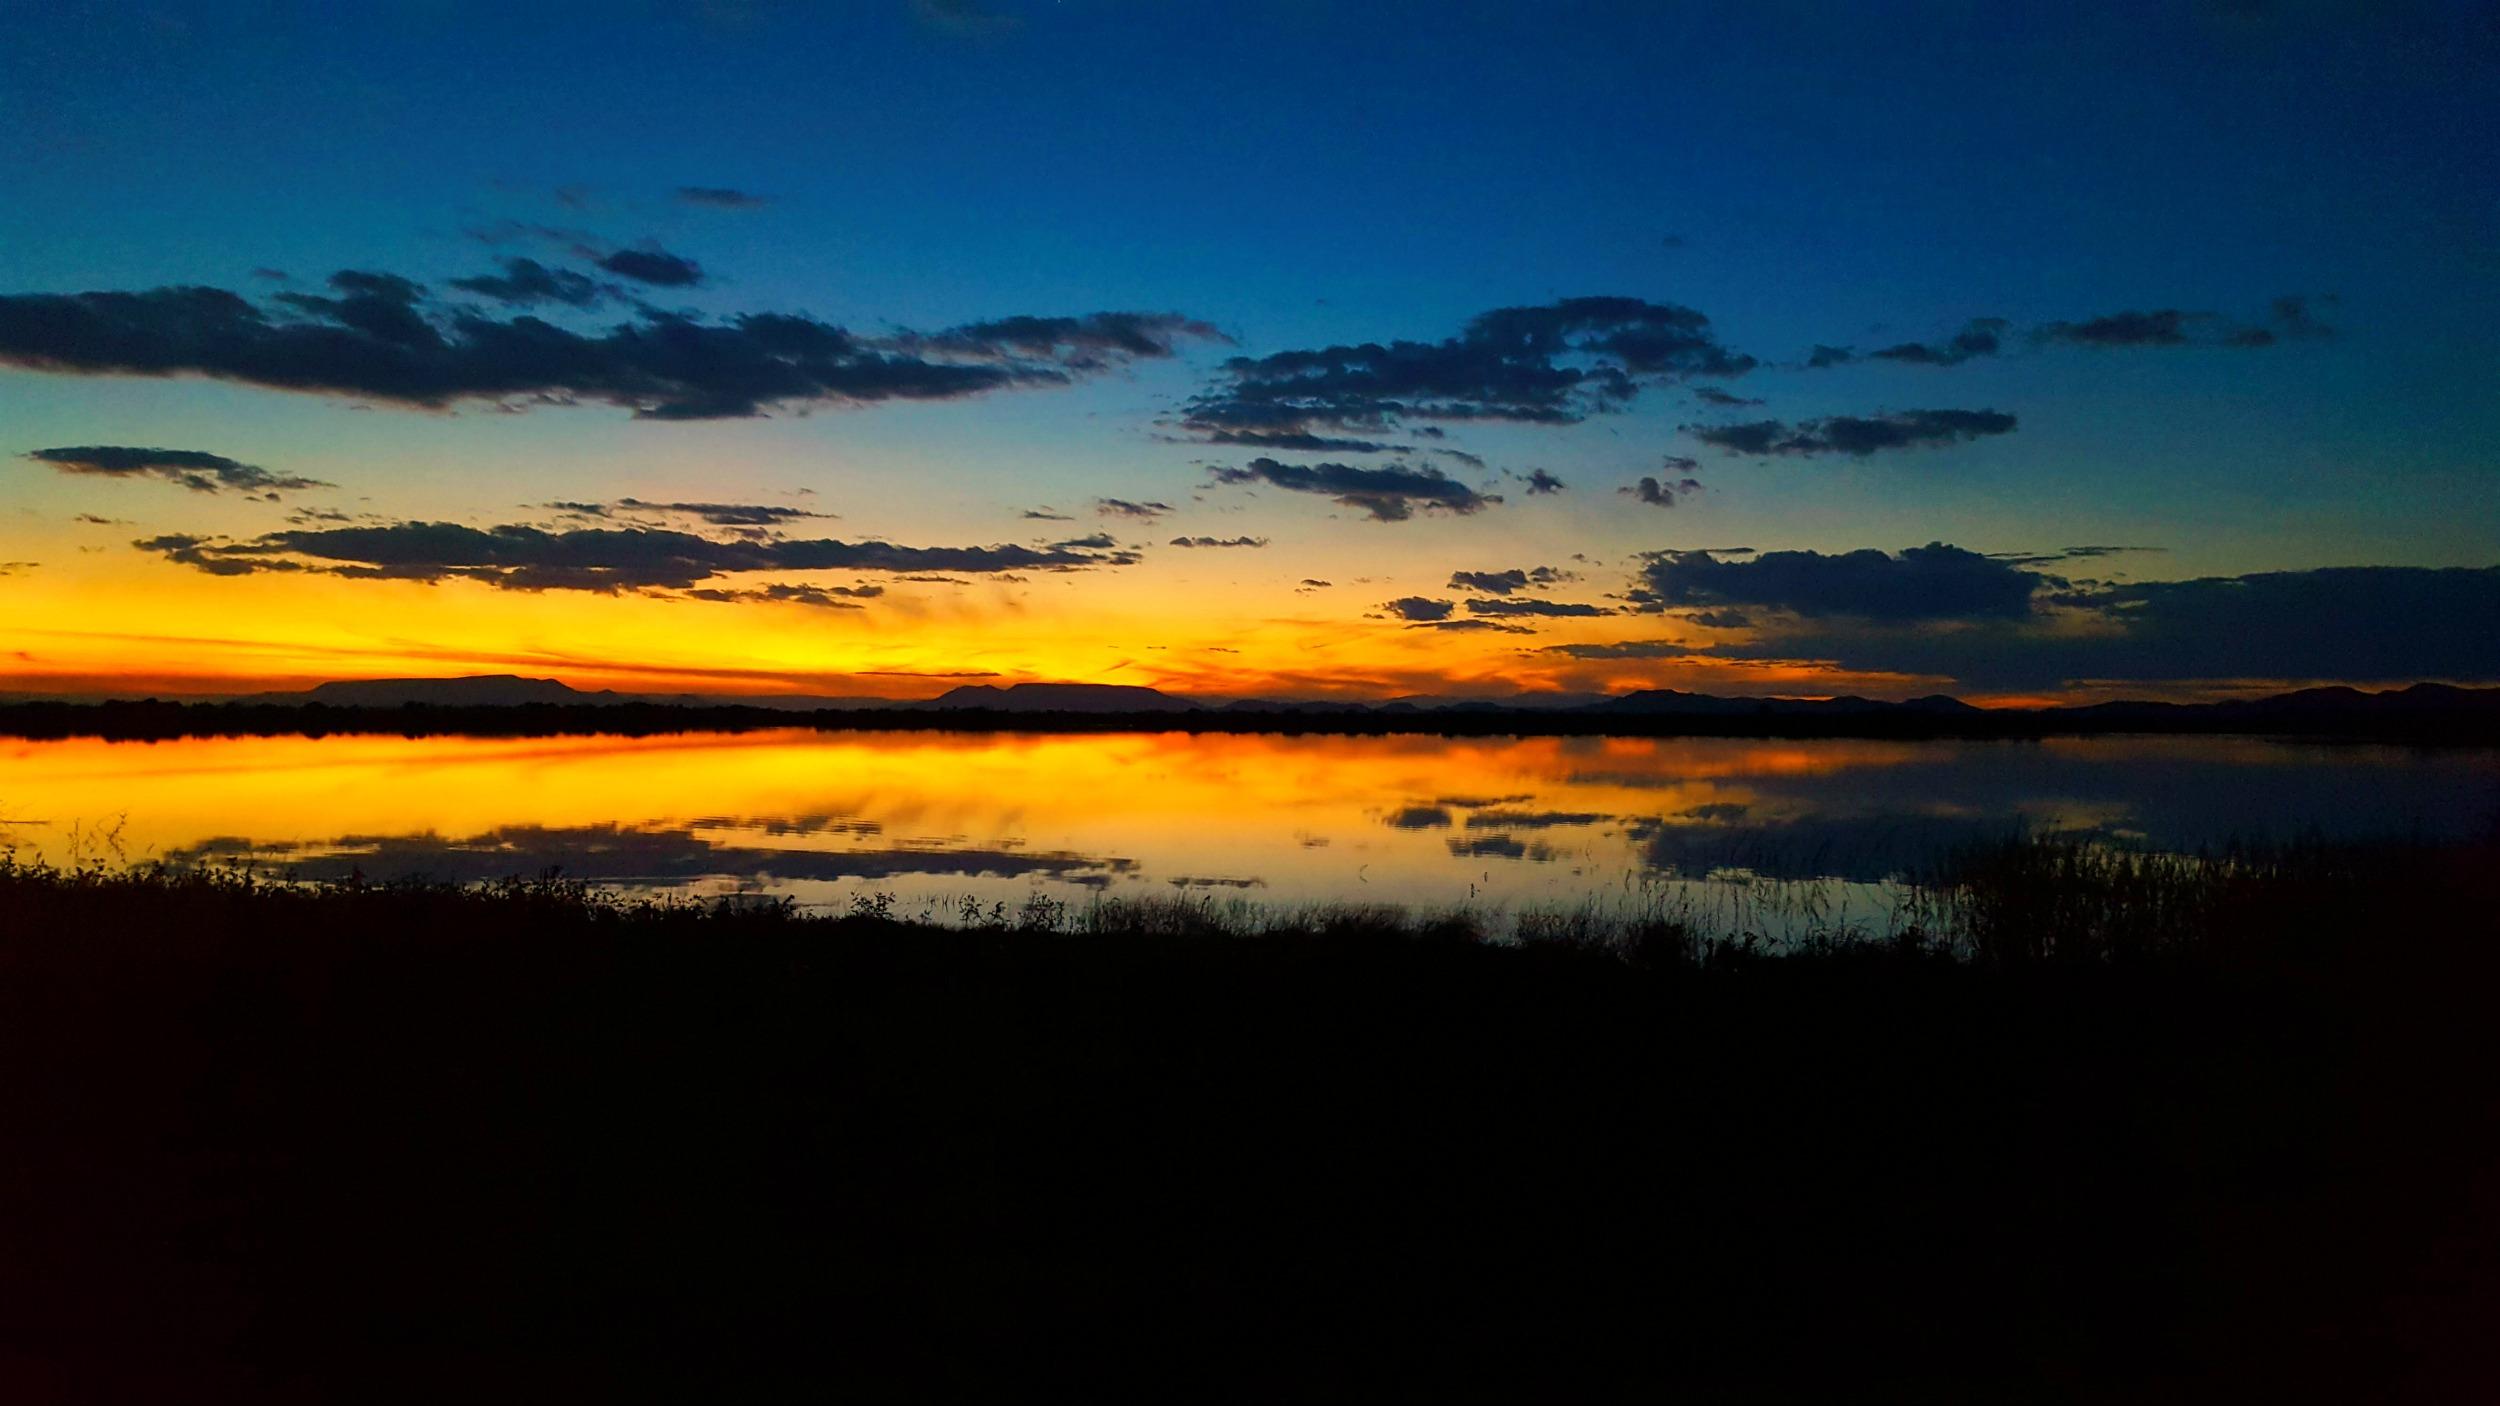 Thoreau, New Mexico